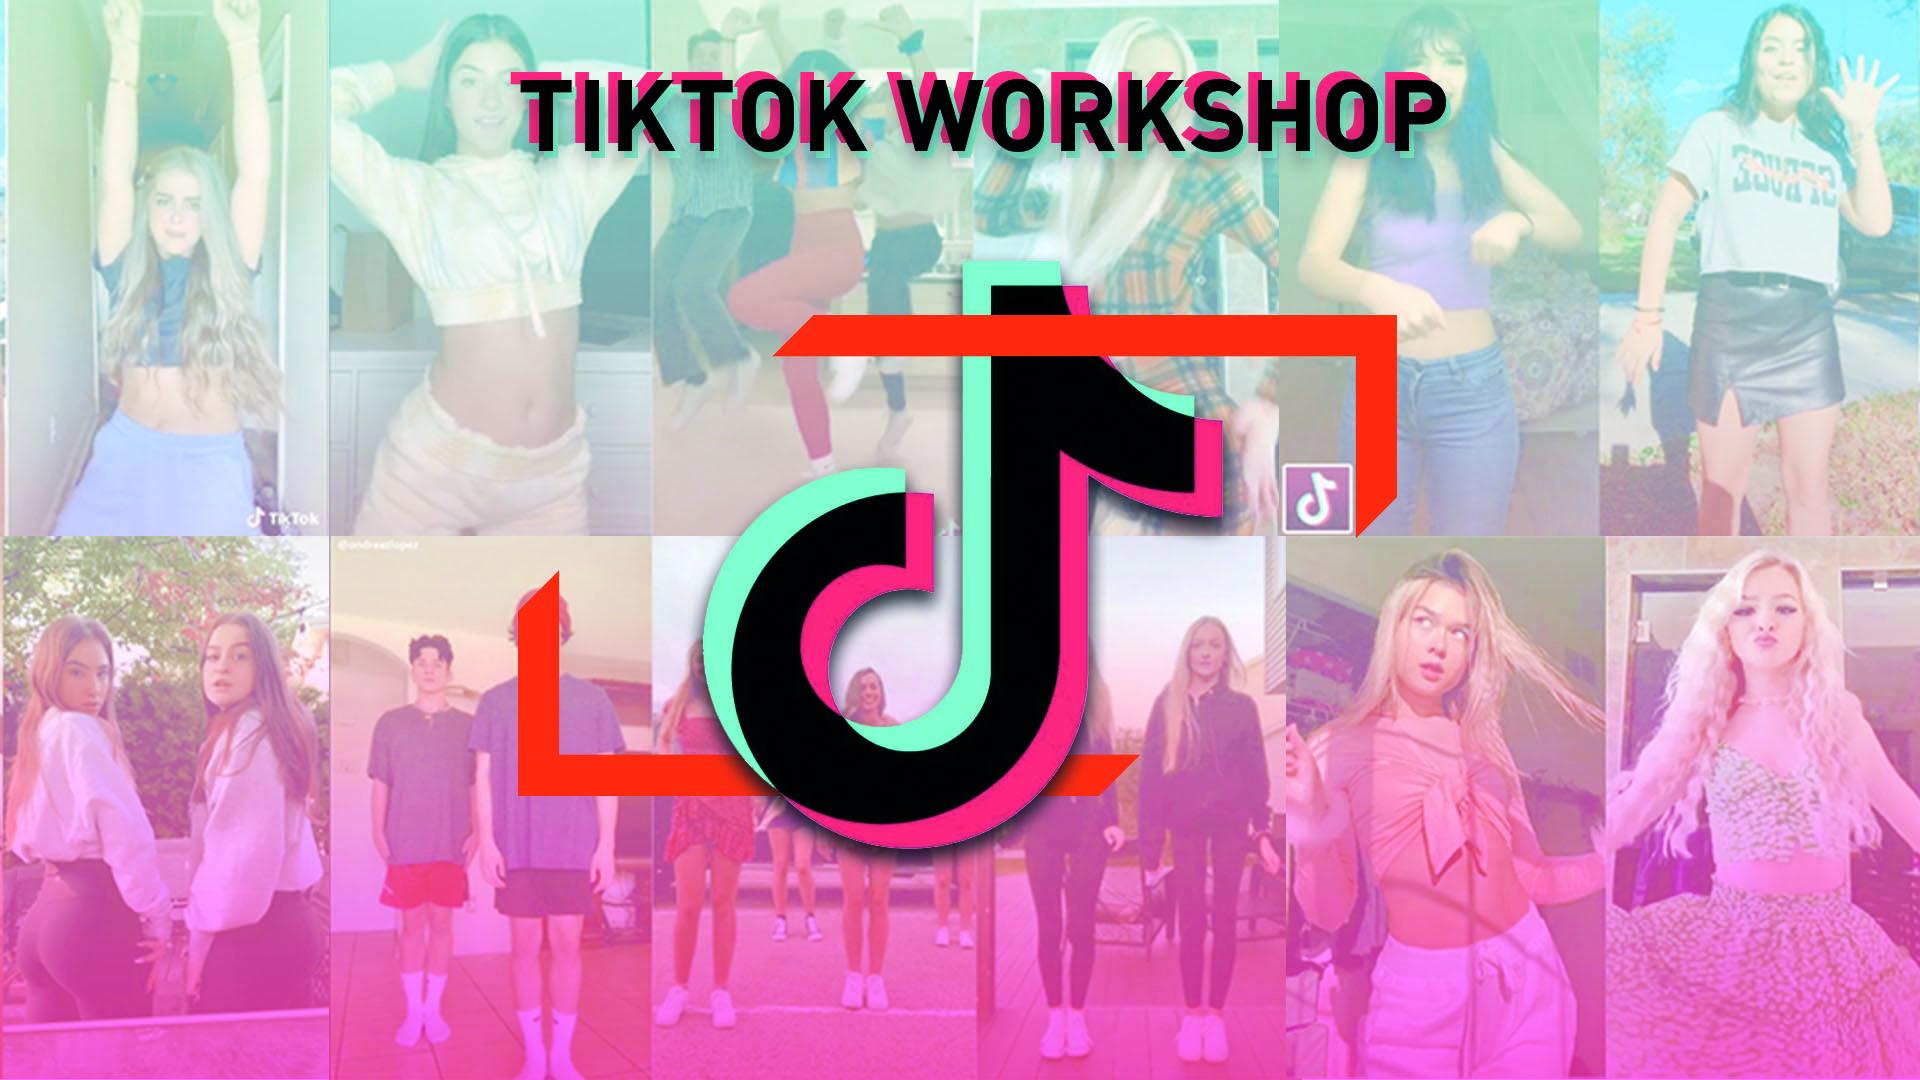 TikTok Workshop